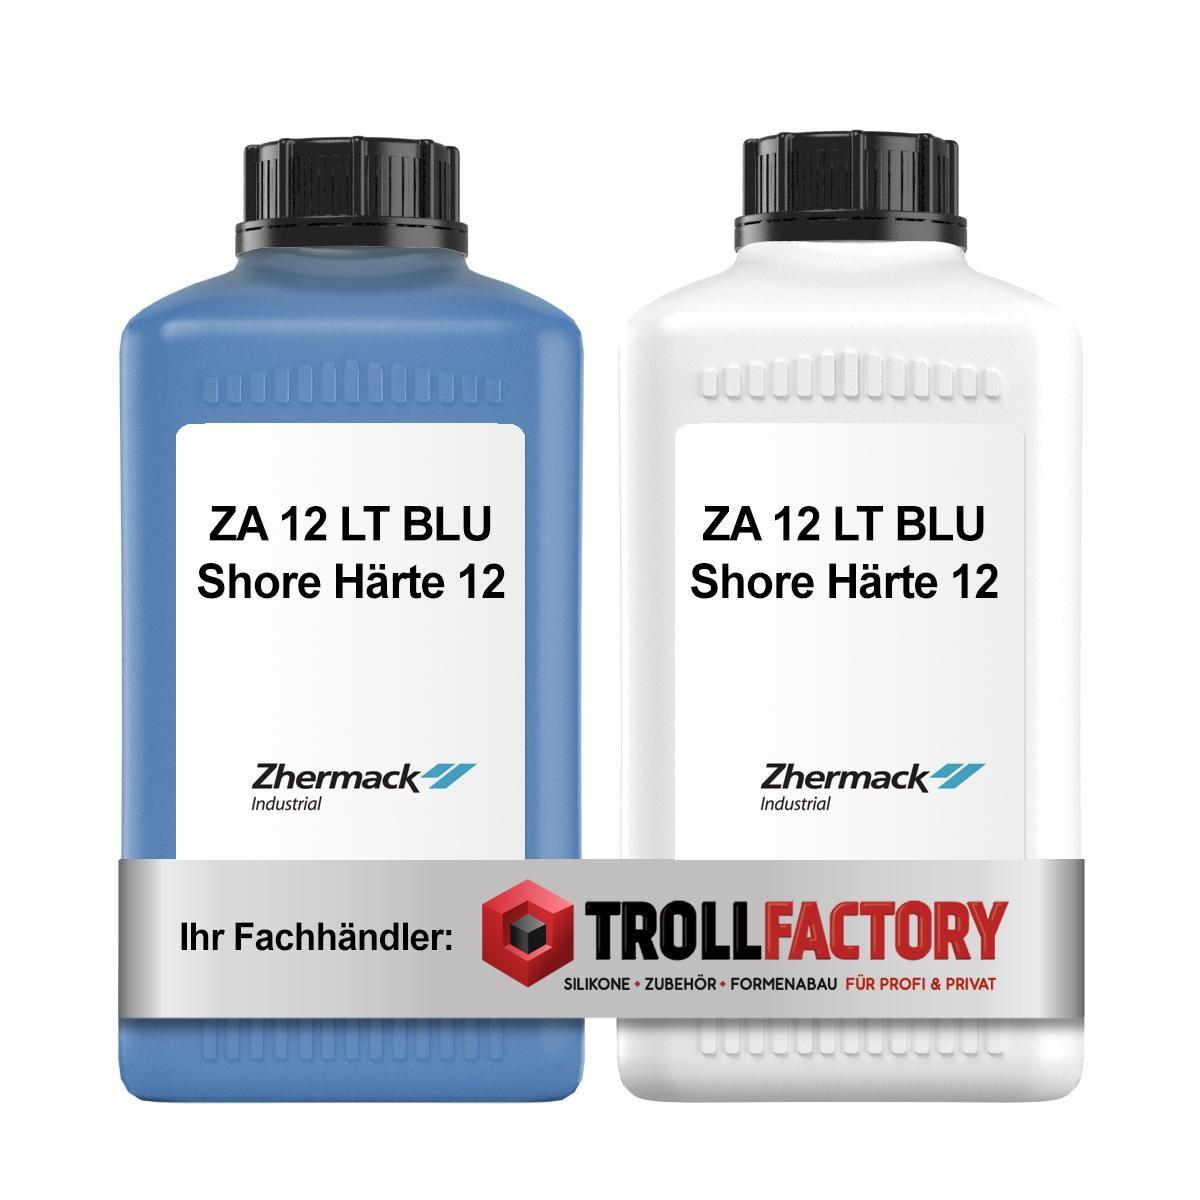 Zhermack Silikon Kautschuk ZA 12 LT BLU Shore Härte 12 - Größe: 10kg (2x5kg)